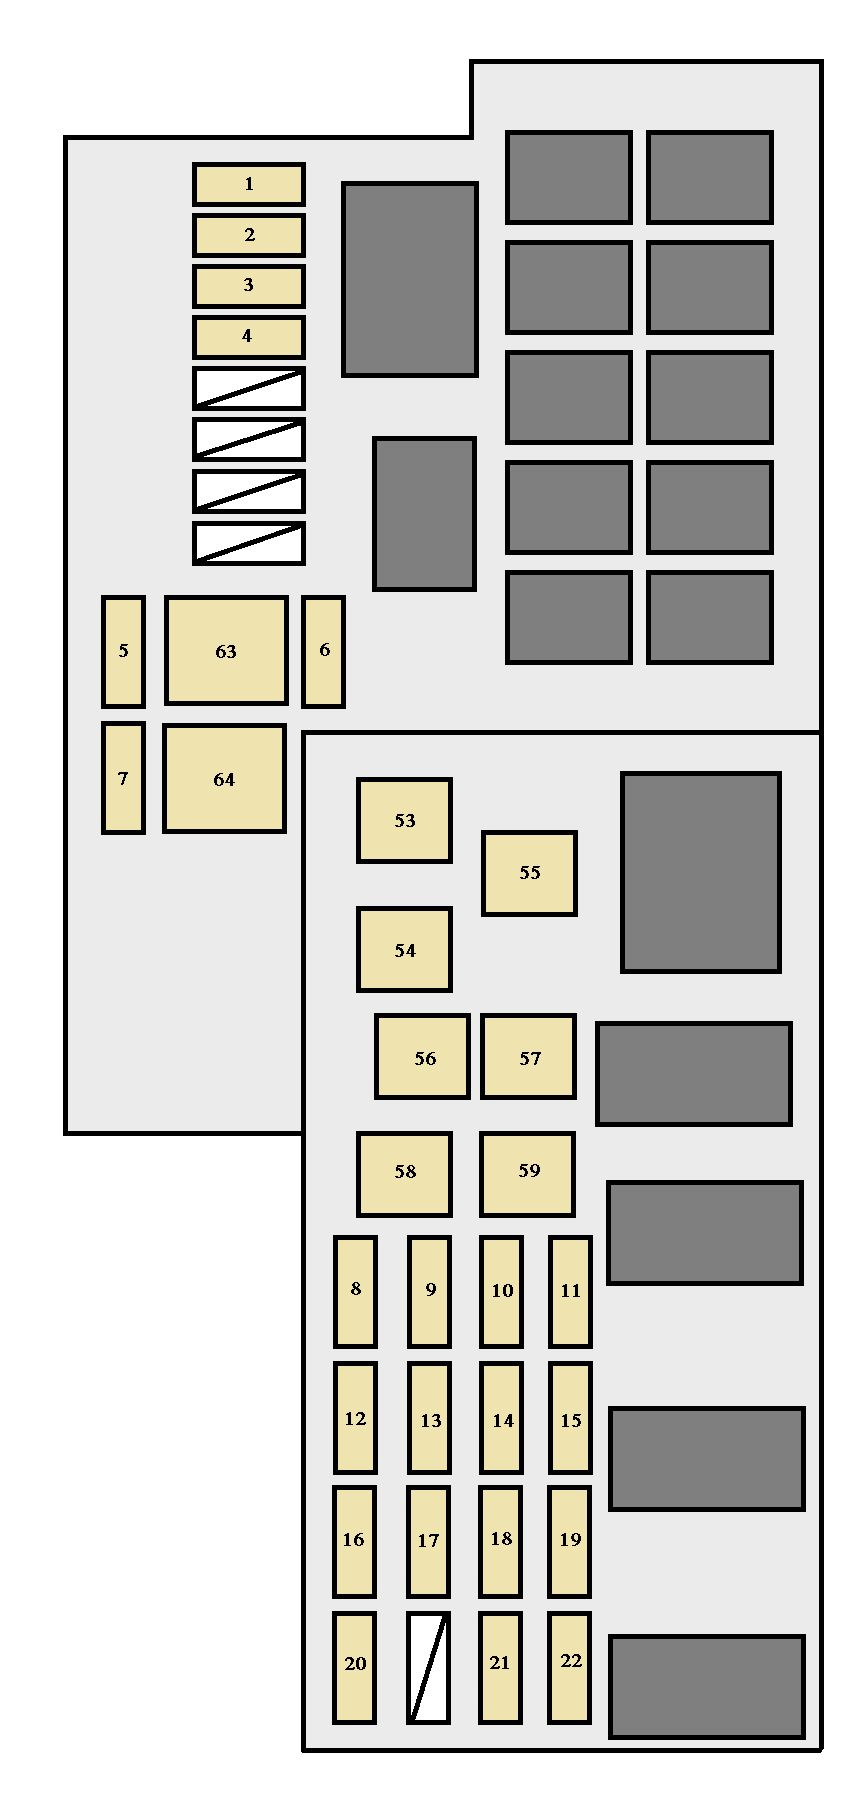 2002 Camry Fuse Box Diagram Detailed Schematics Diagram 1998 Toyota Camry  Fuse Box Diagram 2002 Toyota Camry Fuse Box Diagram